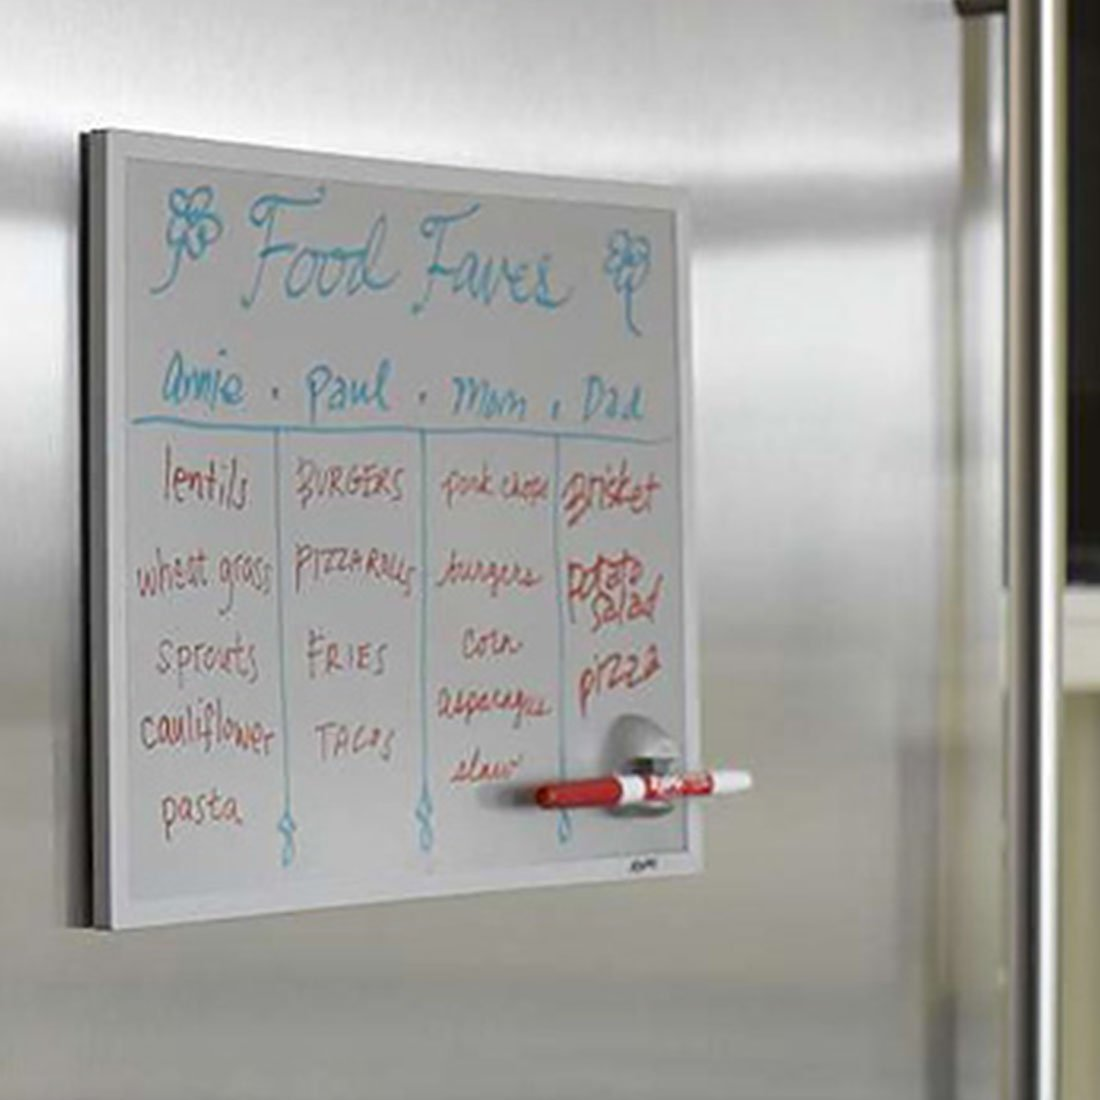 whiteboard-food-menu-hanging-on-refrigerator.jpg